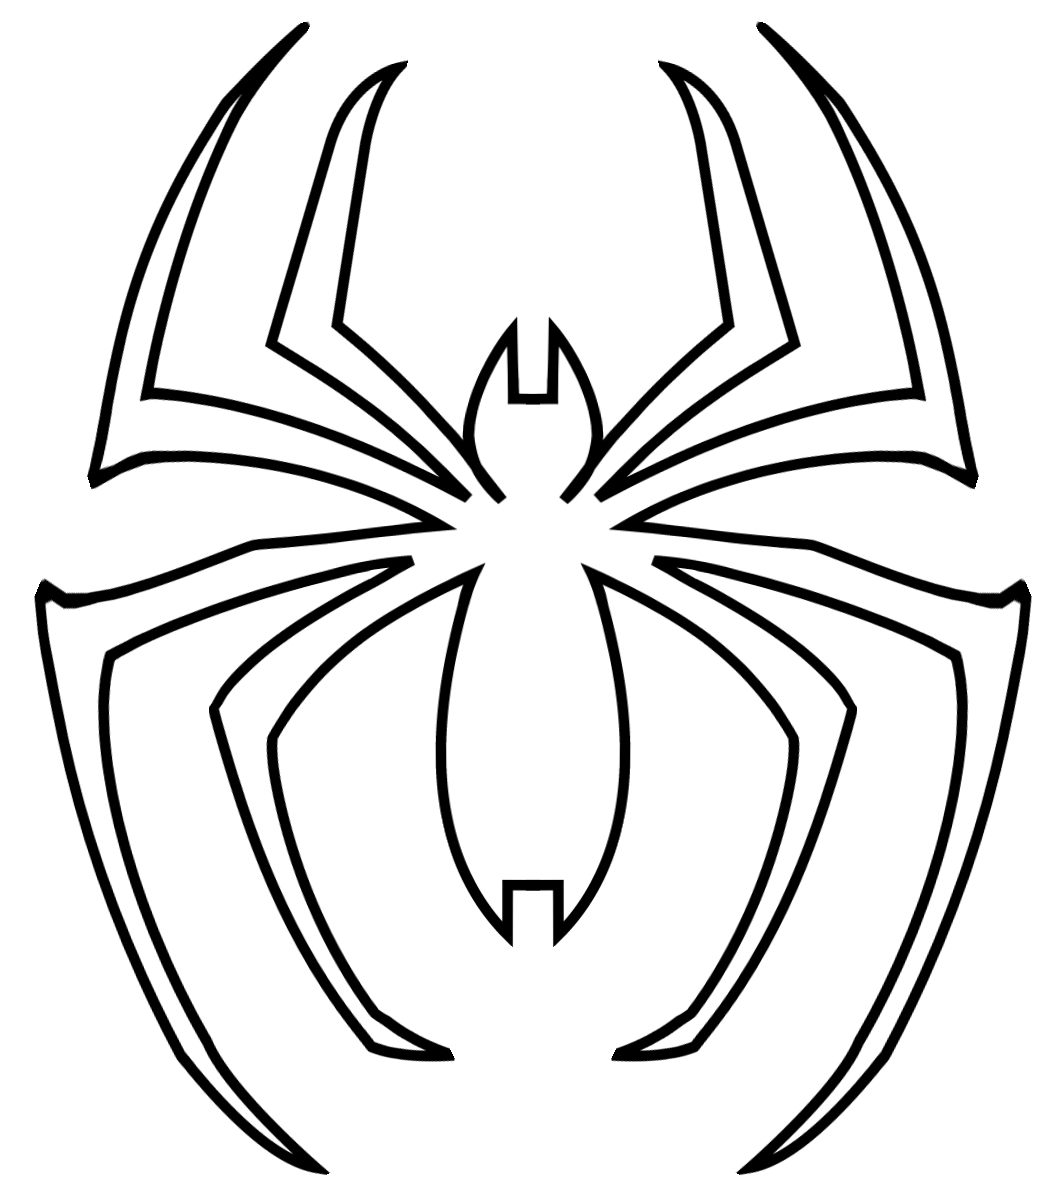 Excepcional Colorear Logo De Spiderman Inspiración - Dibujos Para ...